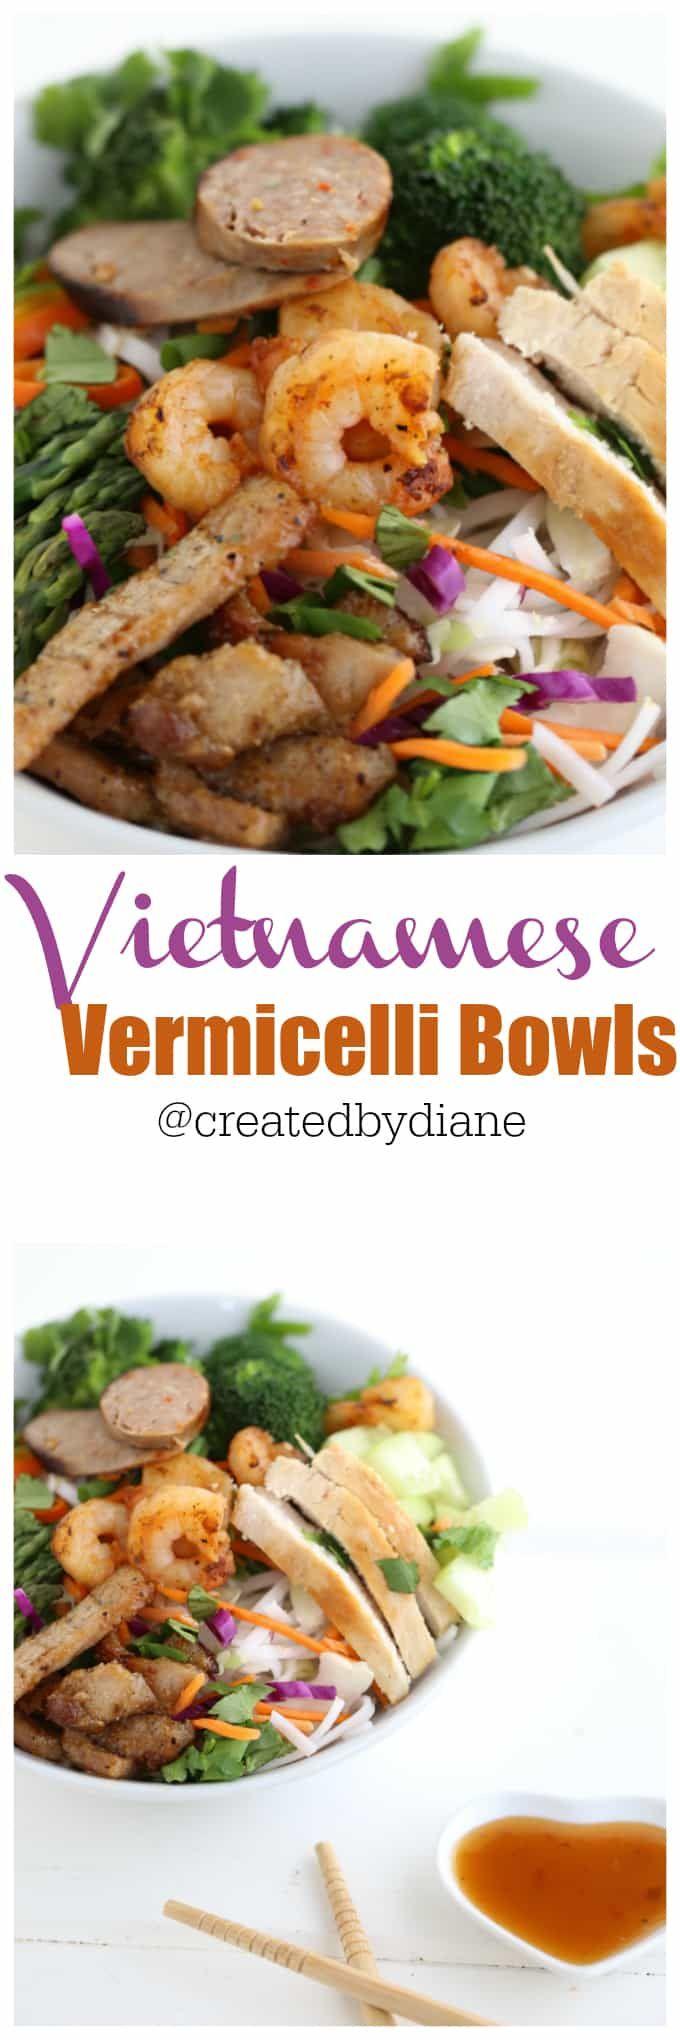 Vietnamese Vermicelli Bowls from @createdbydianeEdit description